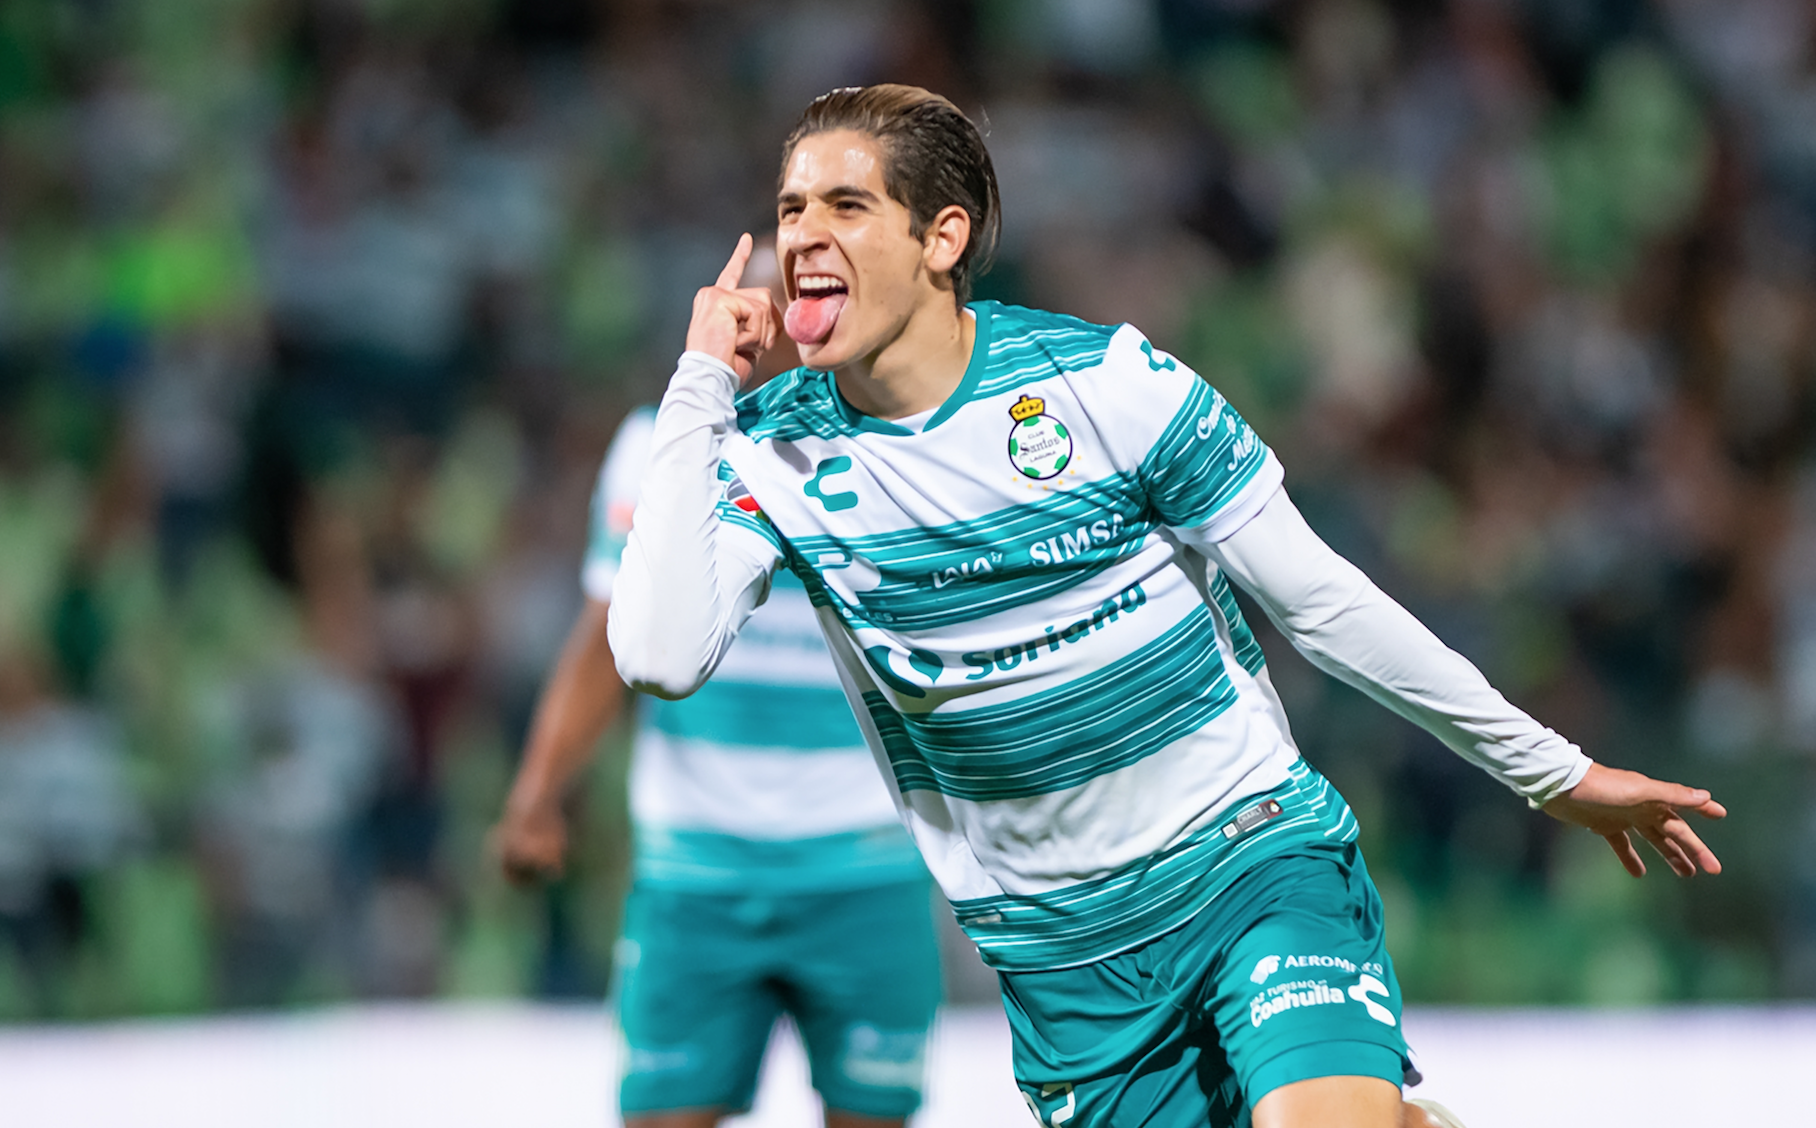 Santiago Muñoz confirma que jugará con Selección Mexicana pese a que fue buscado por Estados Unidos